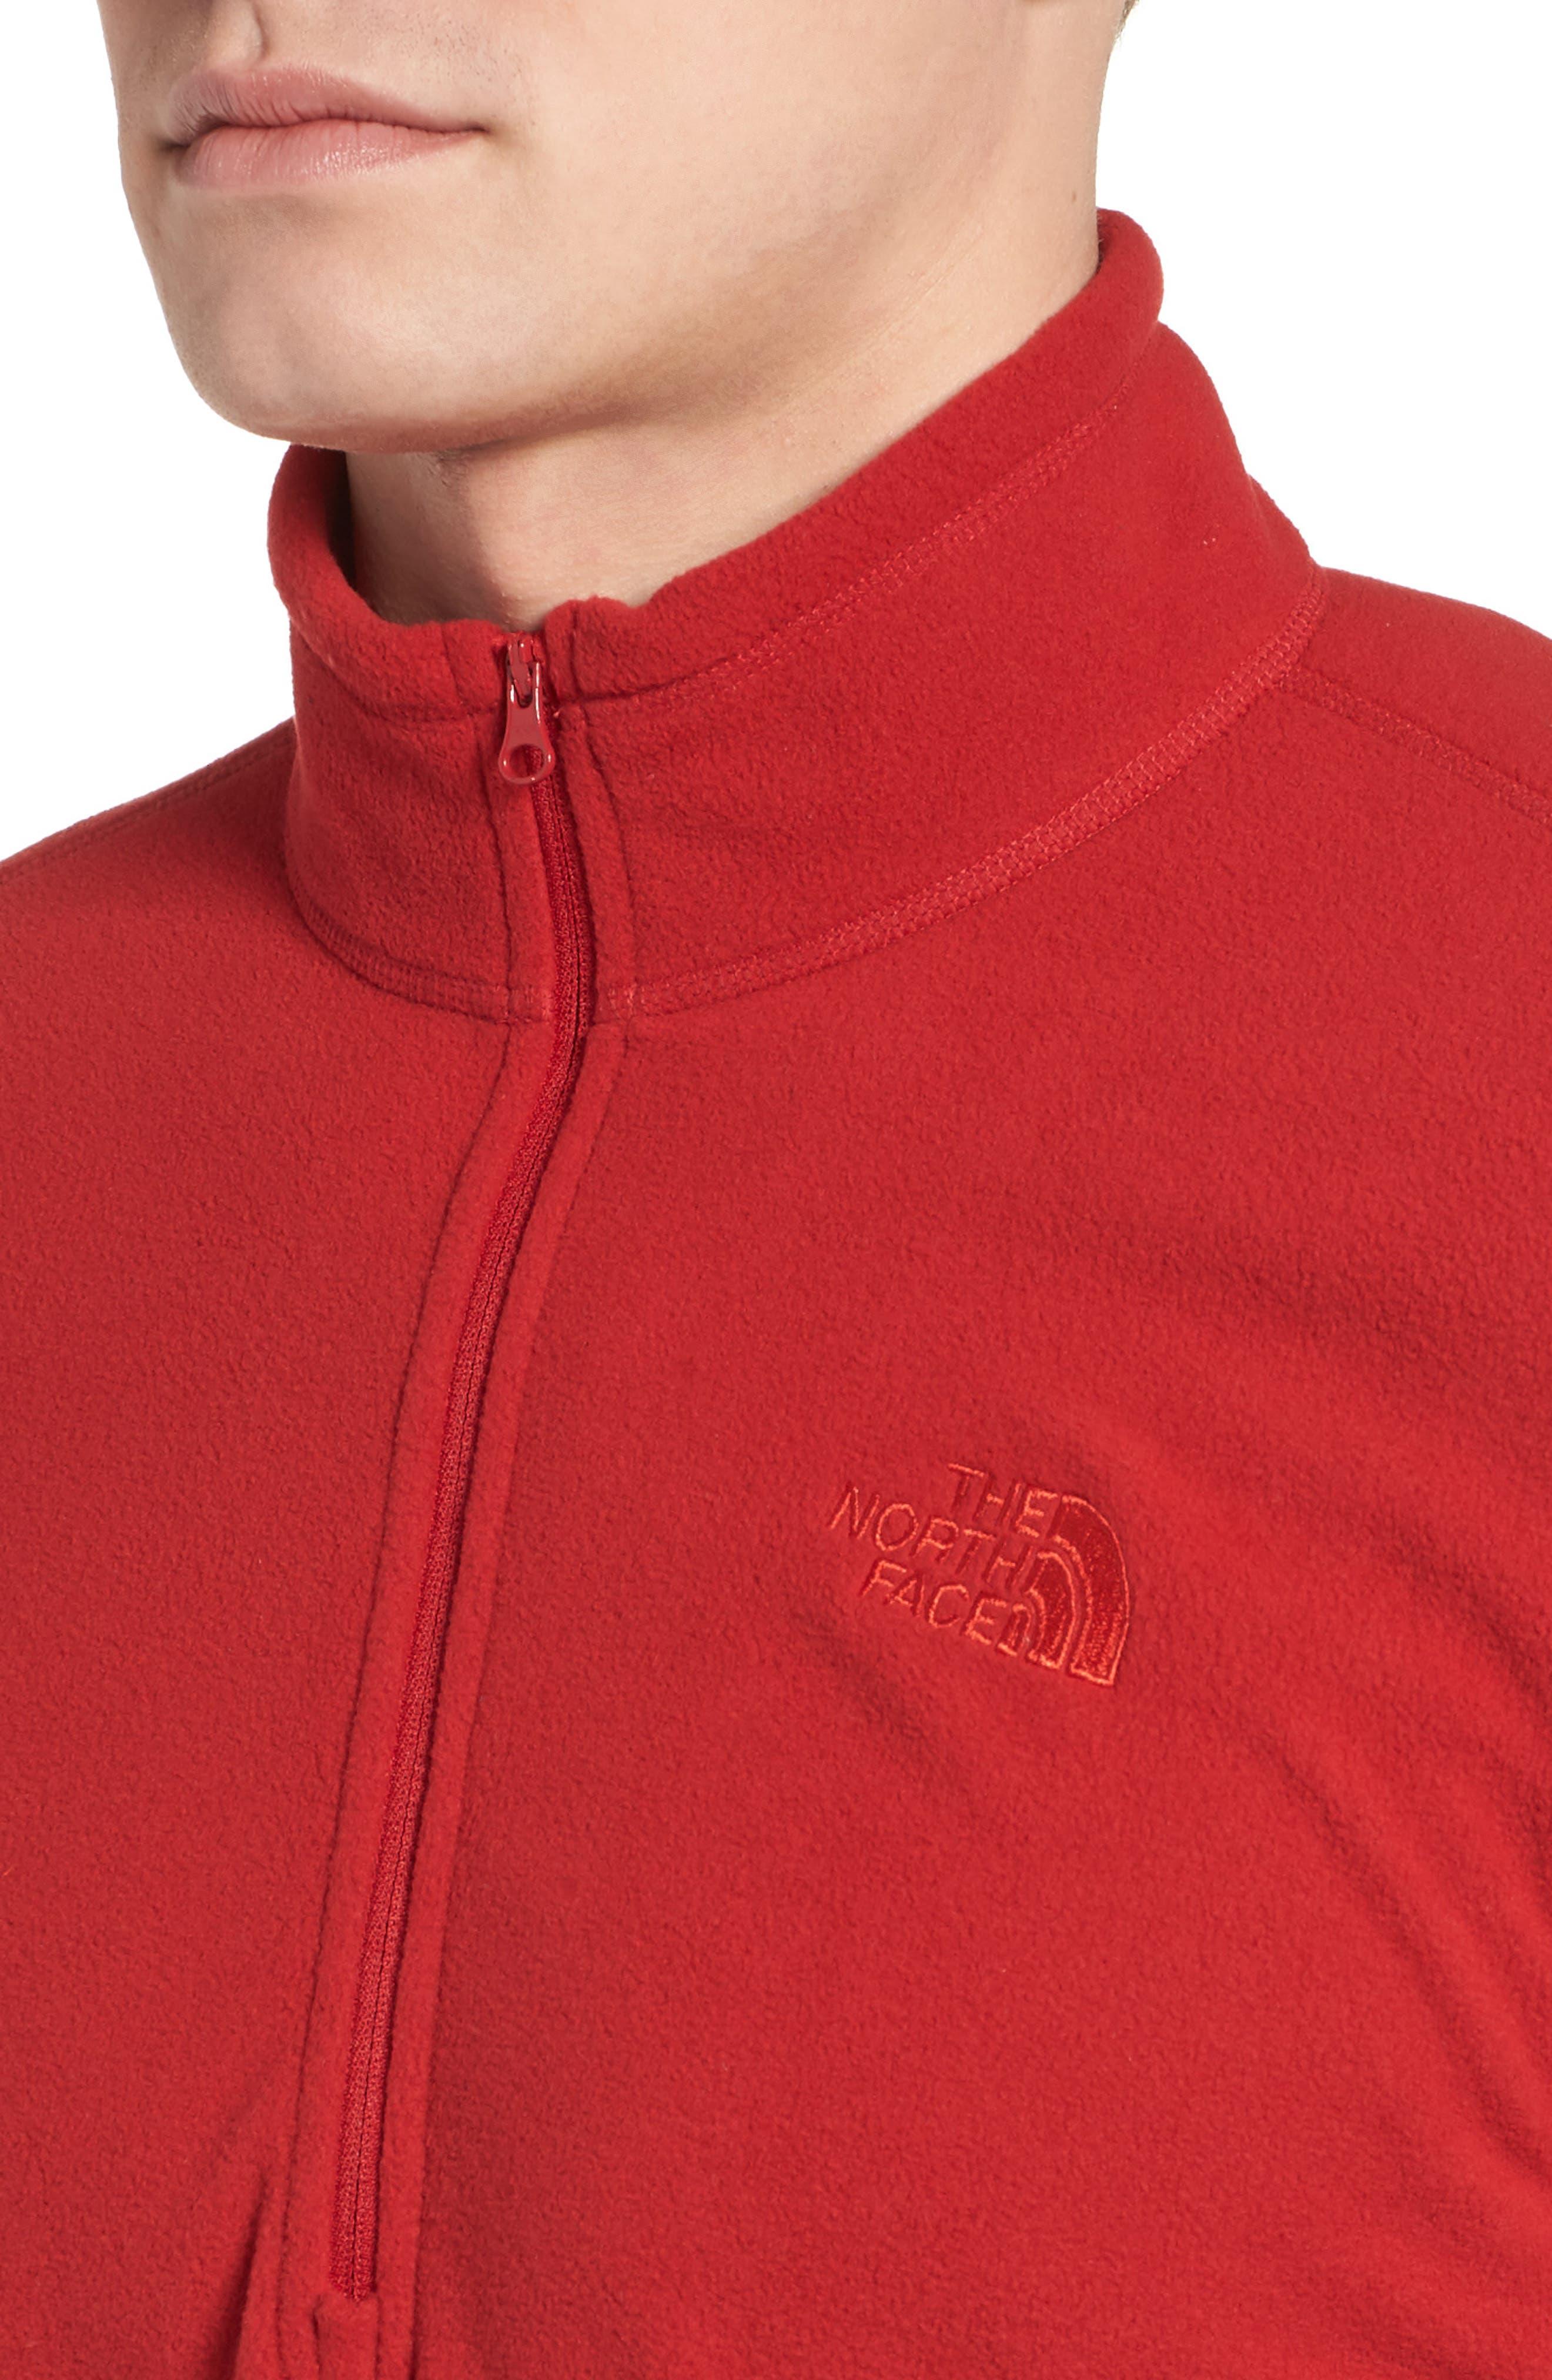 'TKA 100 Glacier' Quarter Zip Fleece Pullover,                             Alternate thumbnail 4, color,                             RAGE RED/ RAGE RED